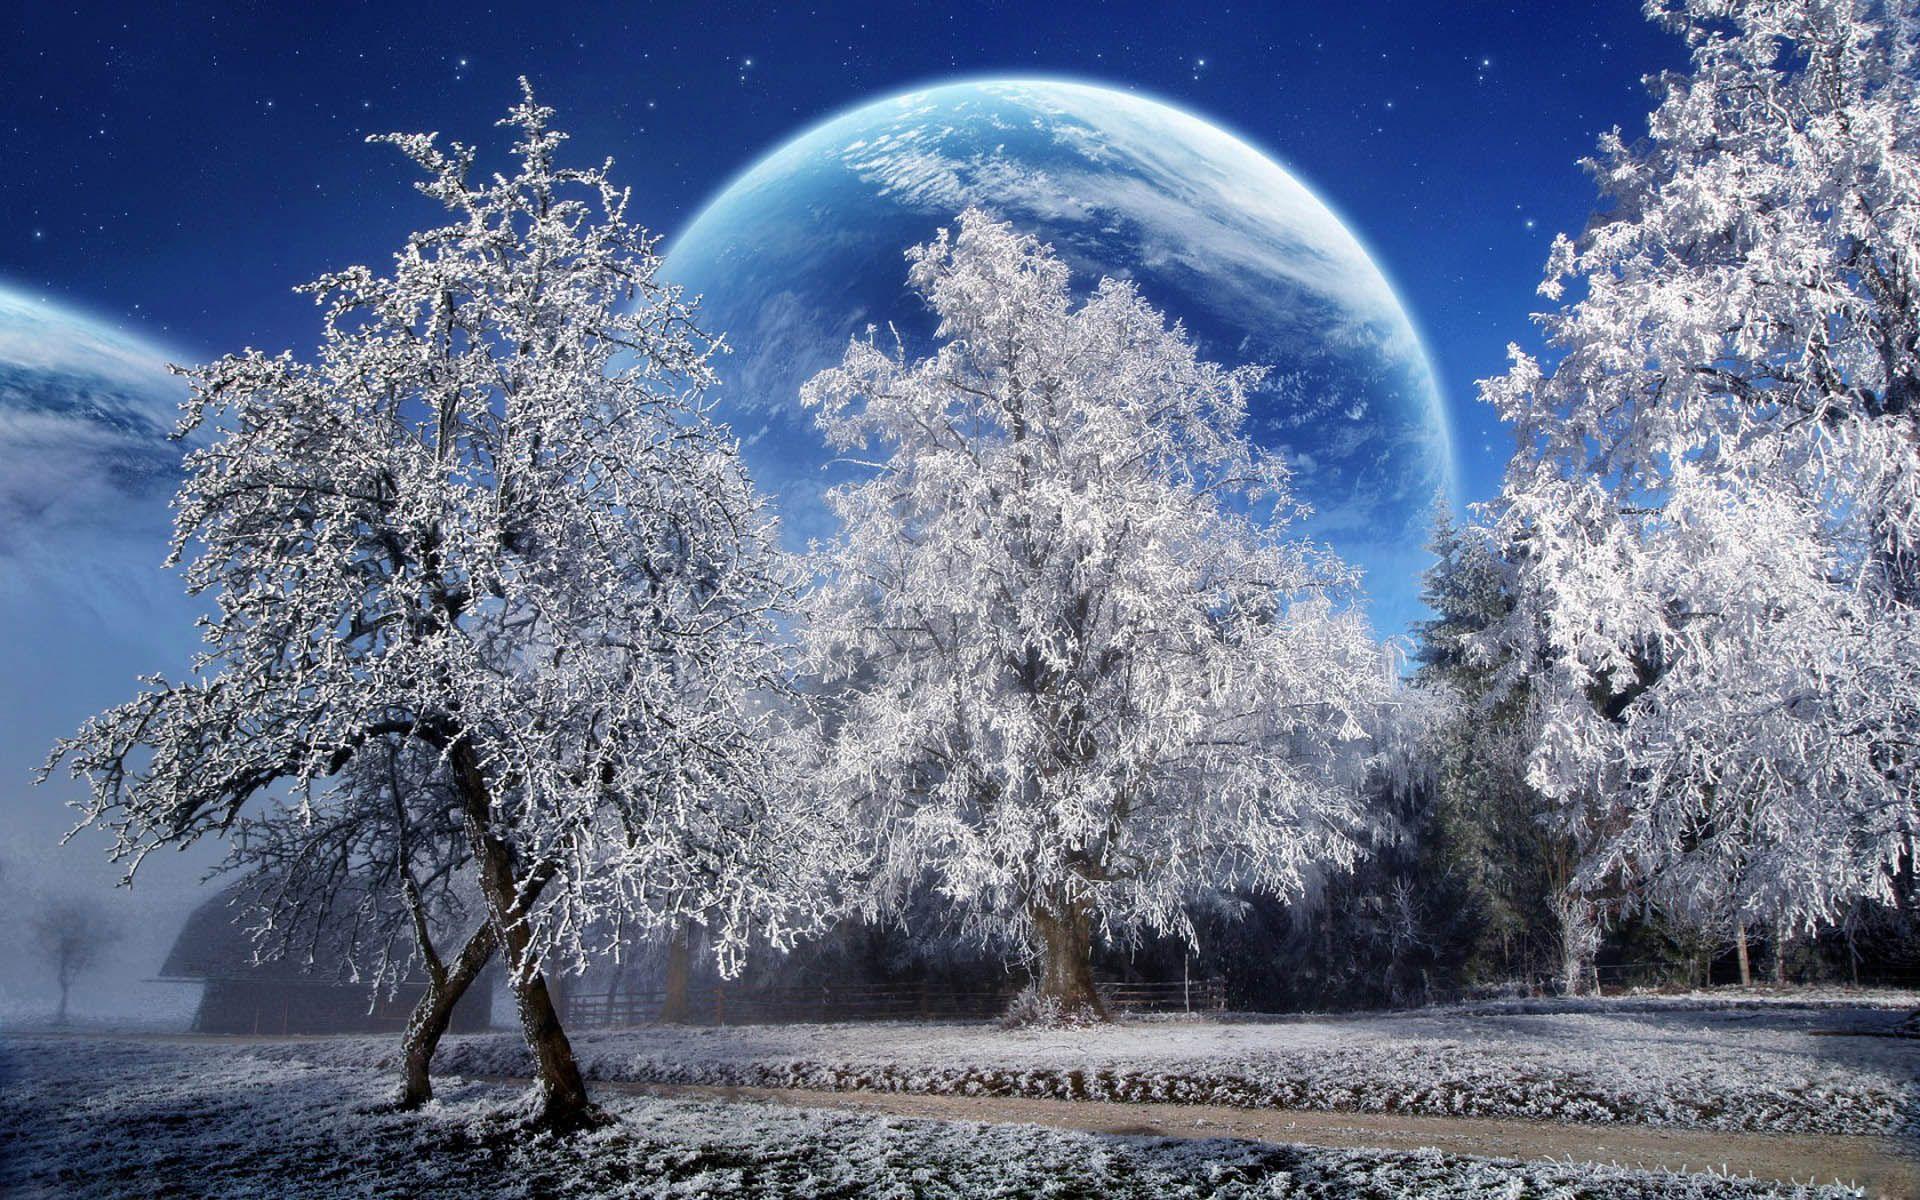 winter photos Download Winter Scenery PowerPoint 1920x1200